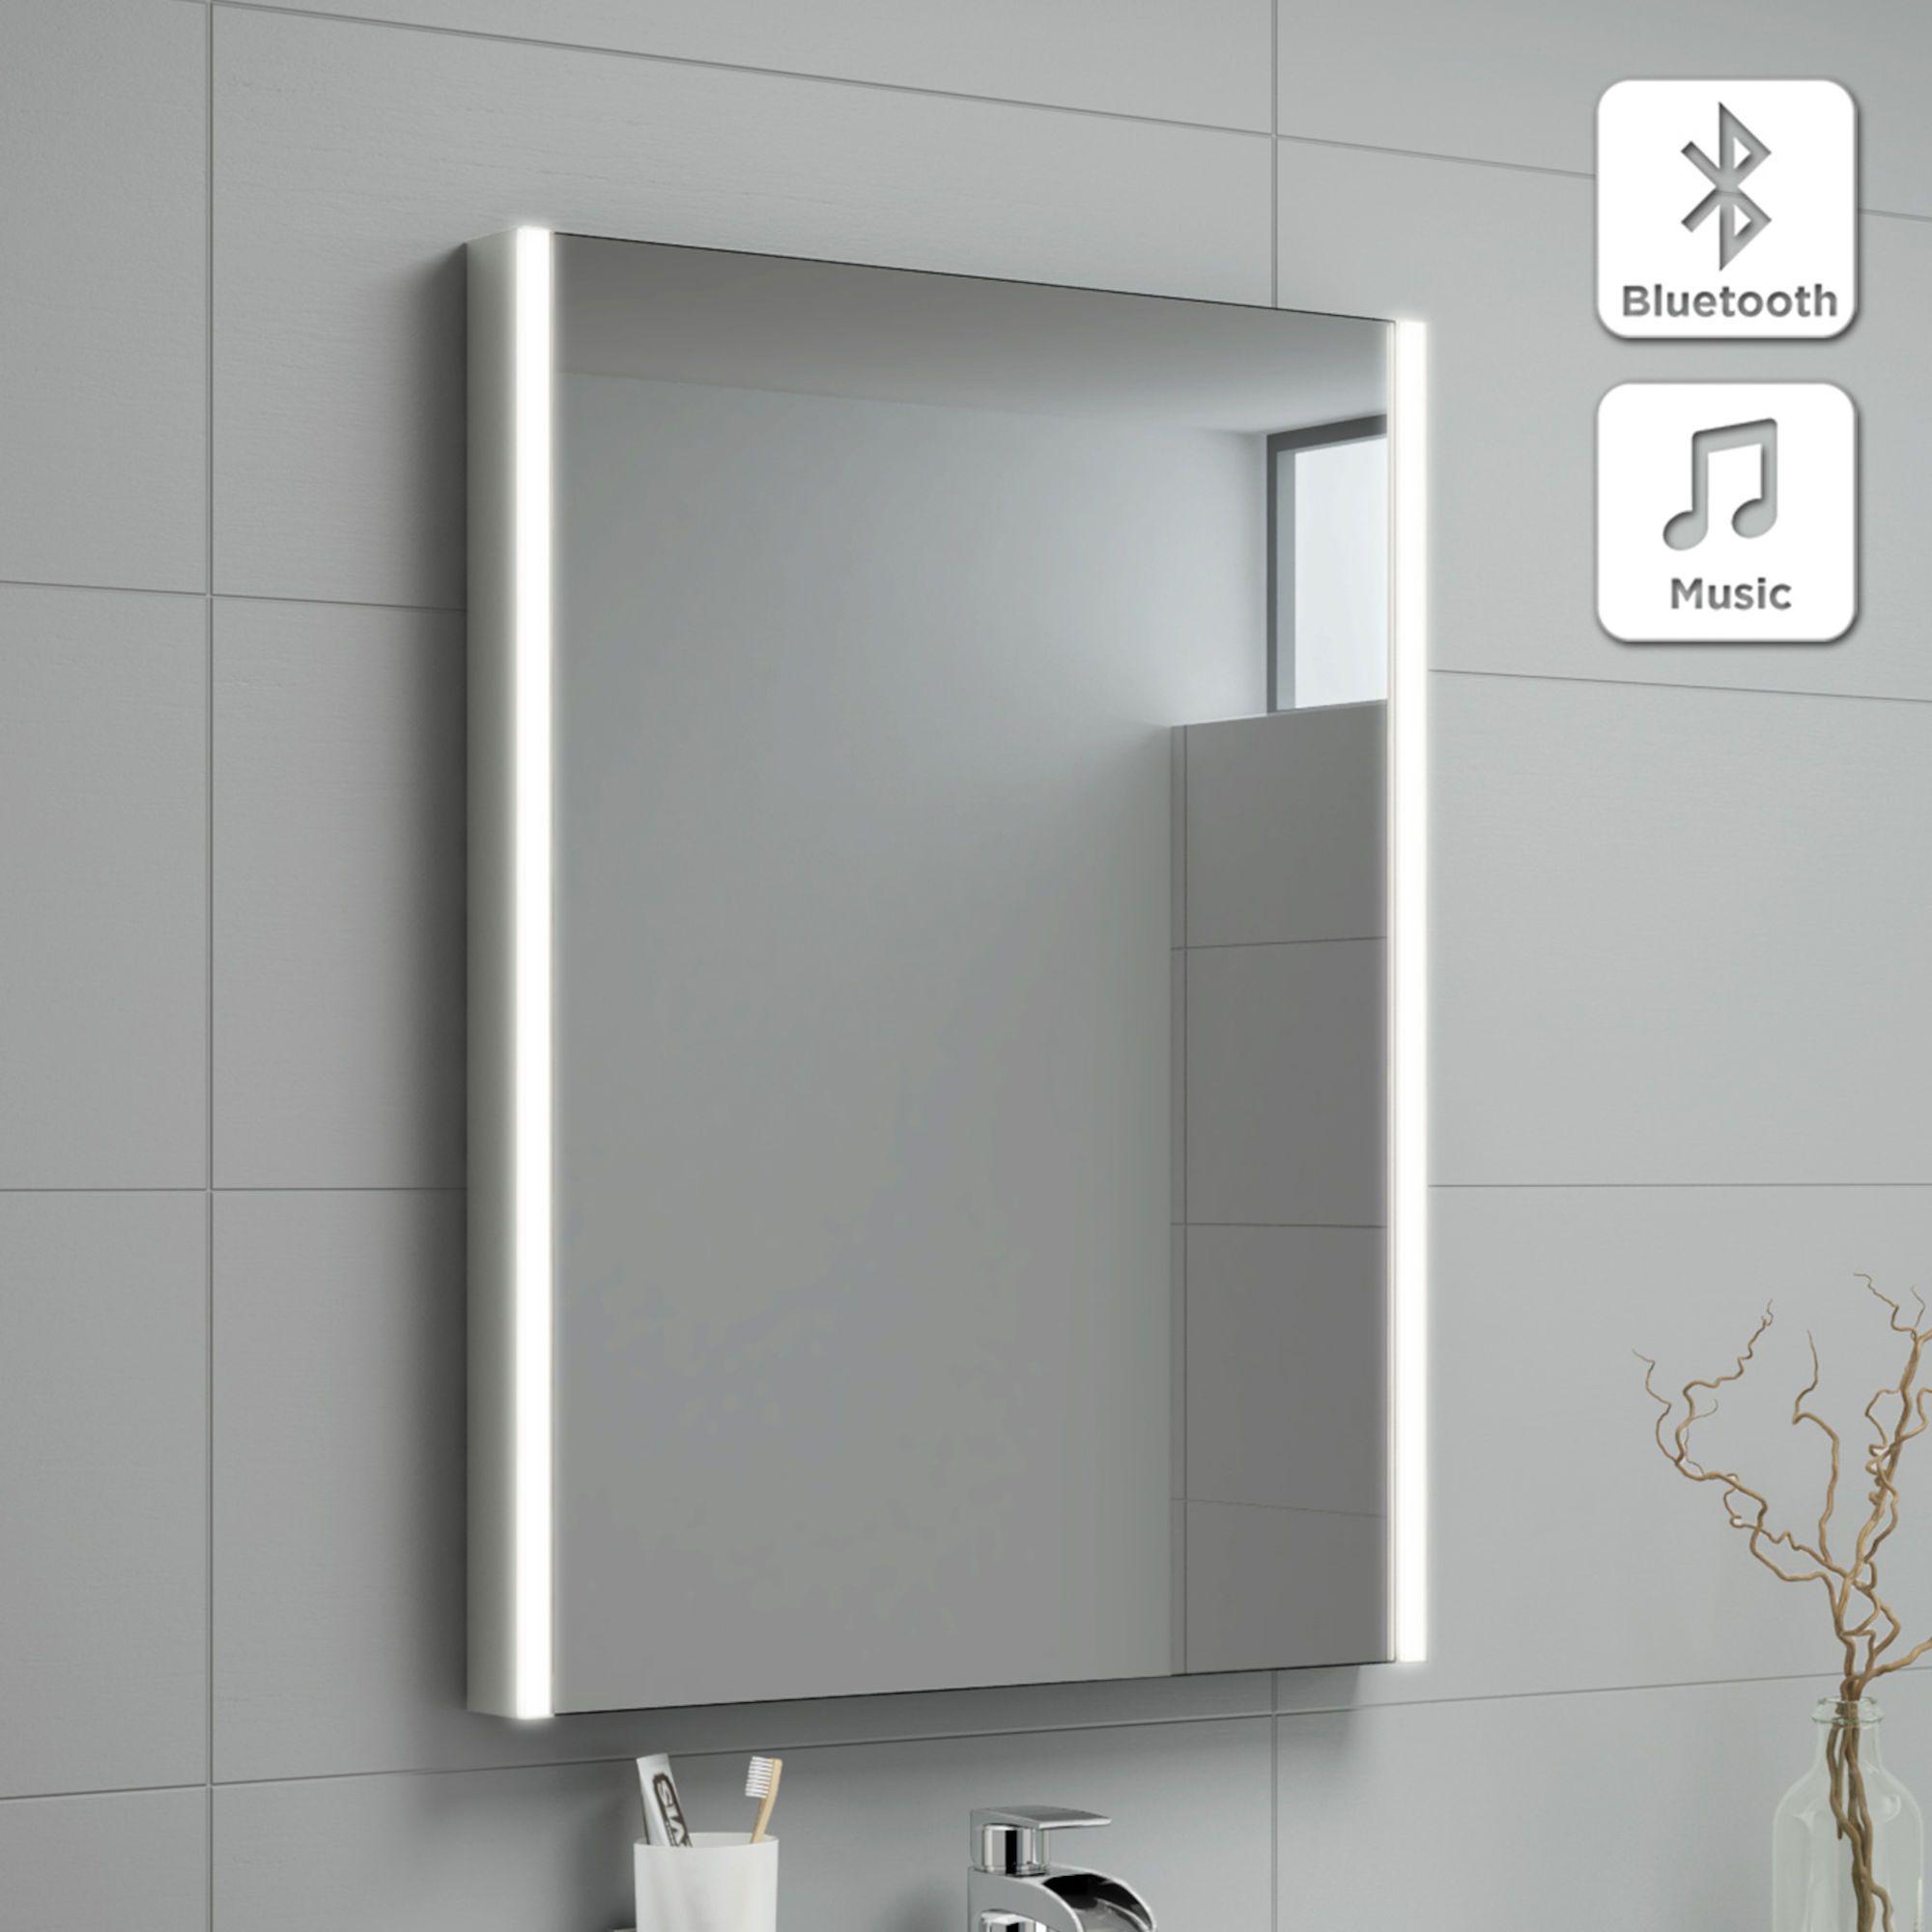 500x700mm Lunar Illuminated Led Mirror Bluetooth Speaker Amazing Bathrooms Led Mirror Bathroom Bathroom Mirror Design